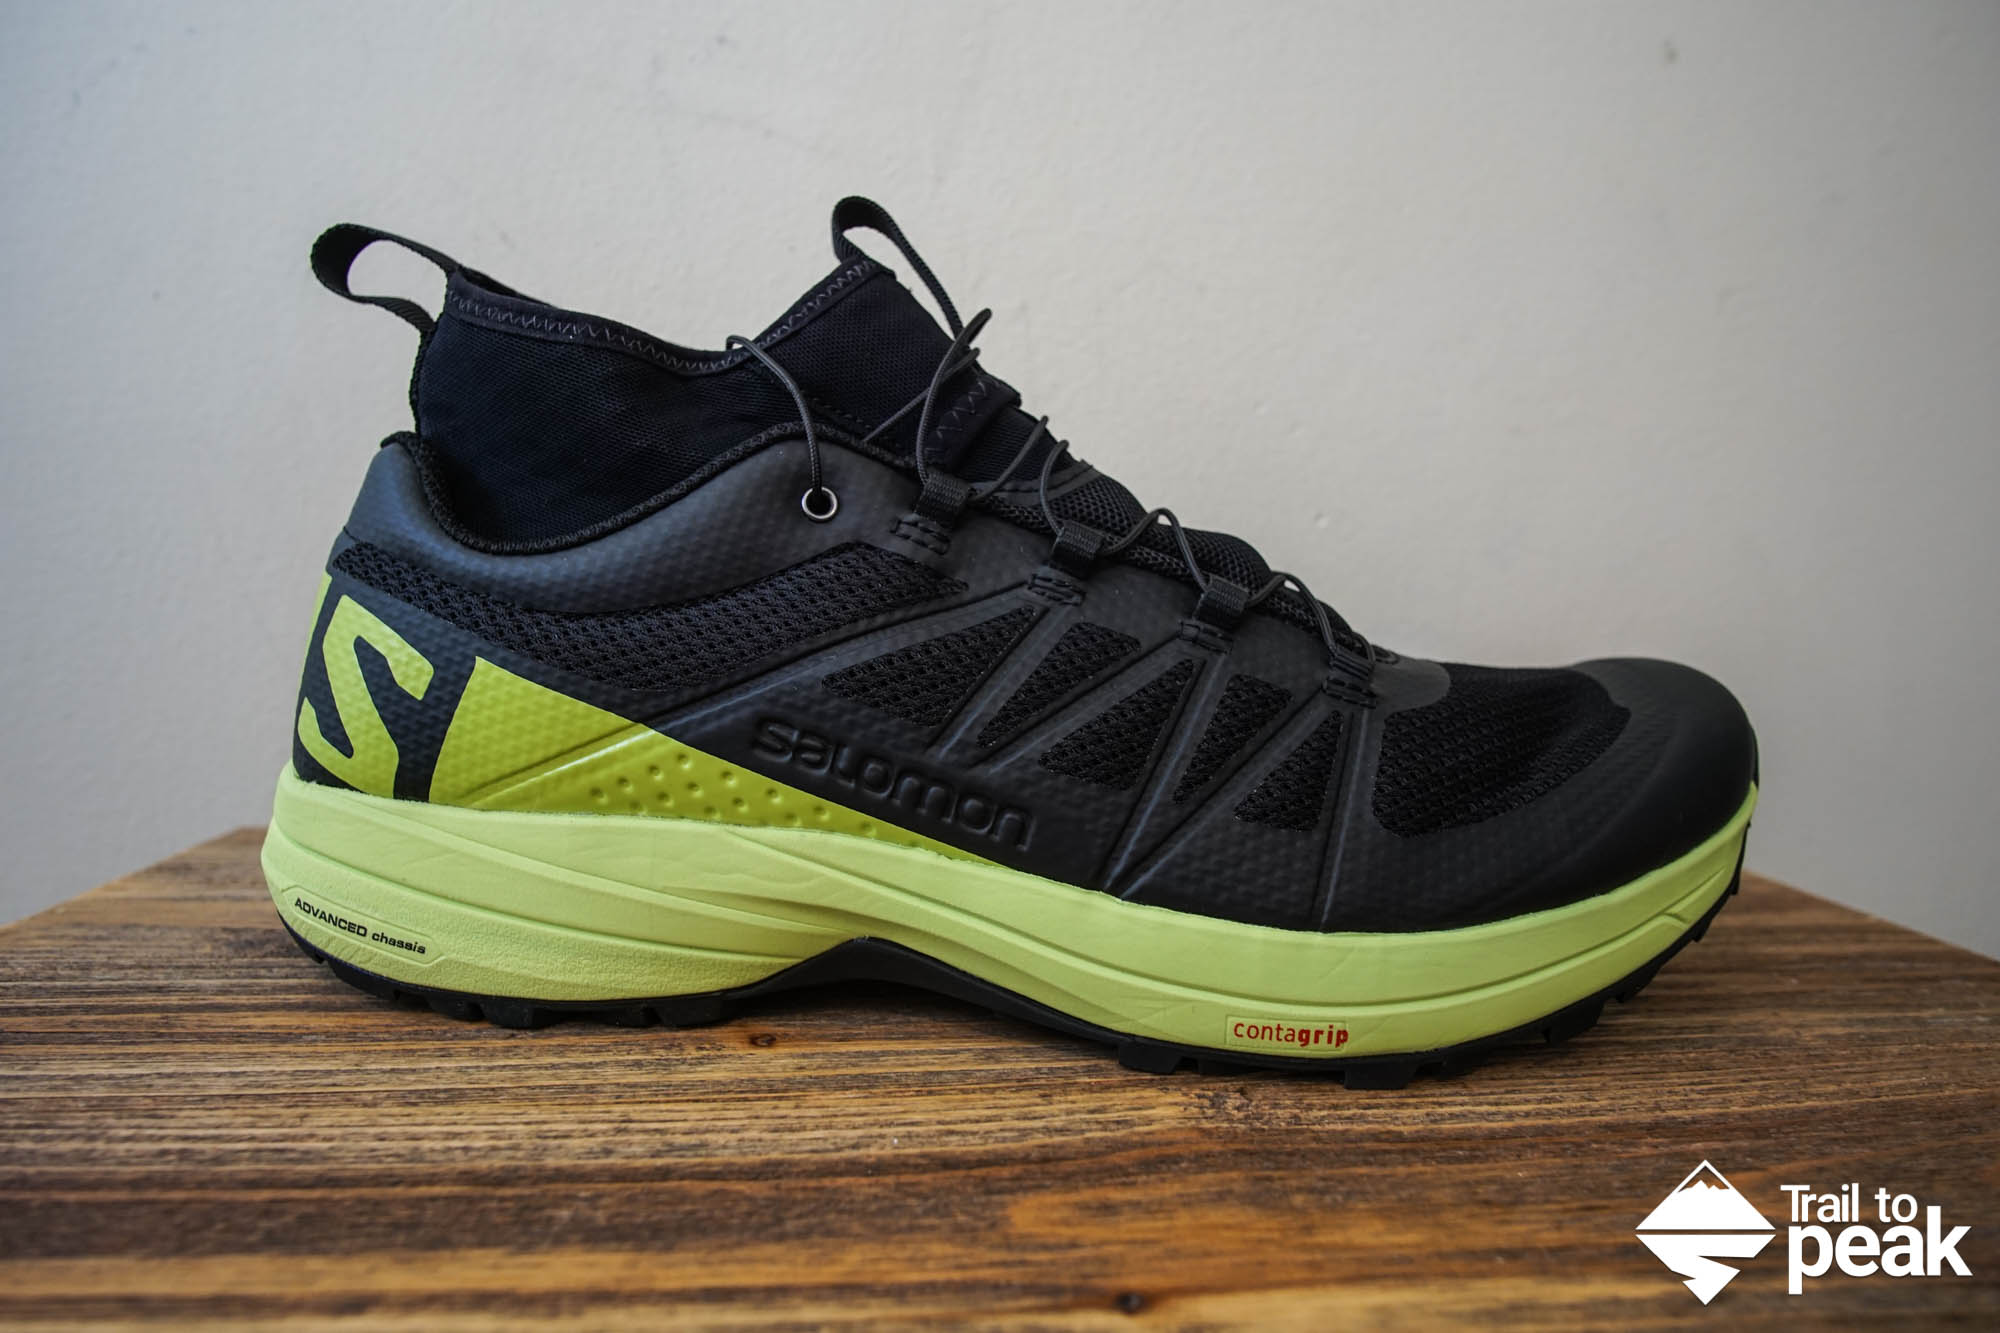 Enduro Salomon Xa Preview Gear Trail Peak To q0Pvznnxw